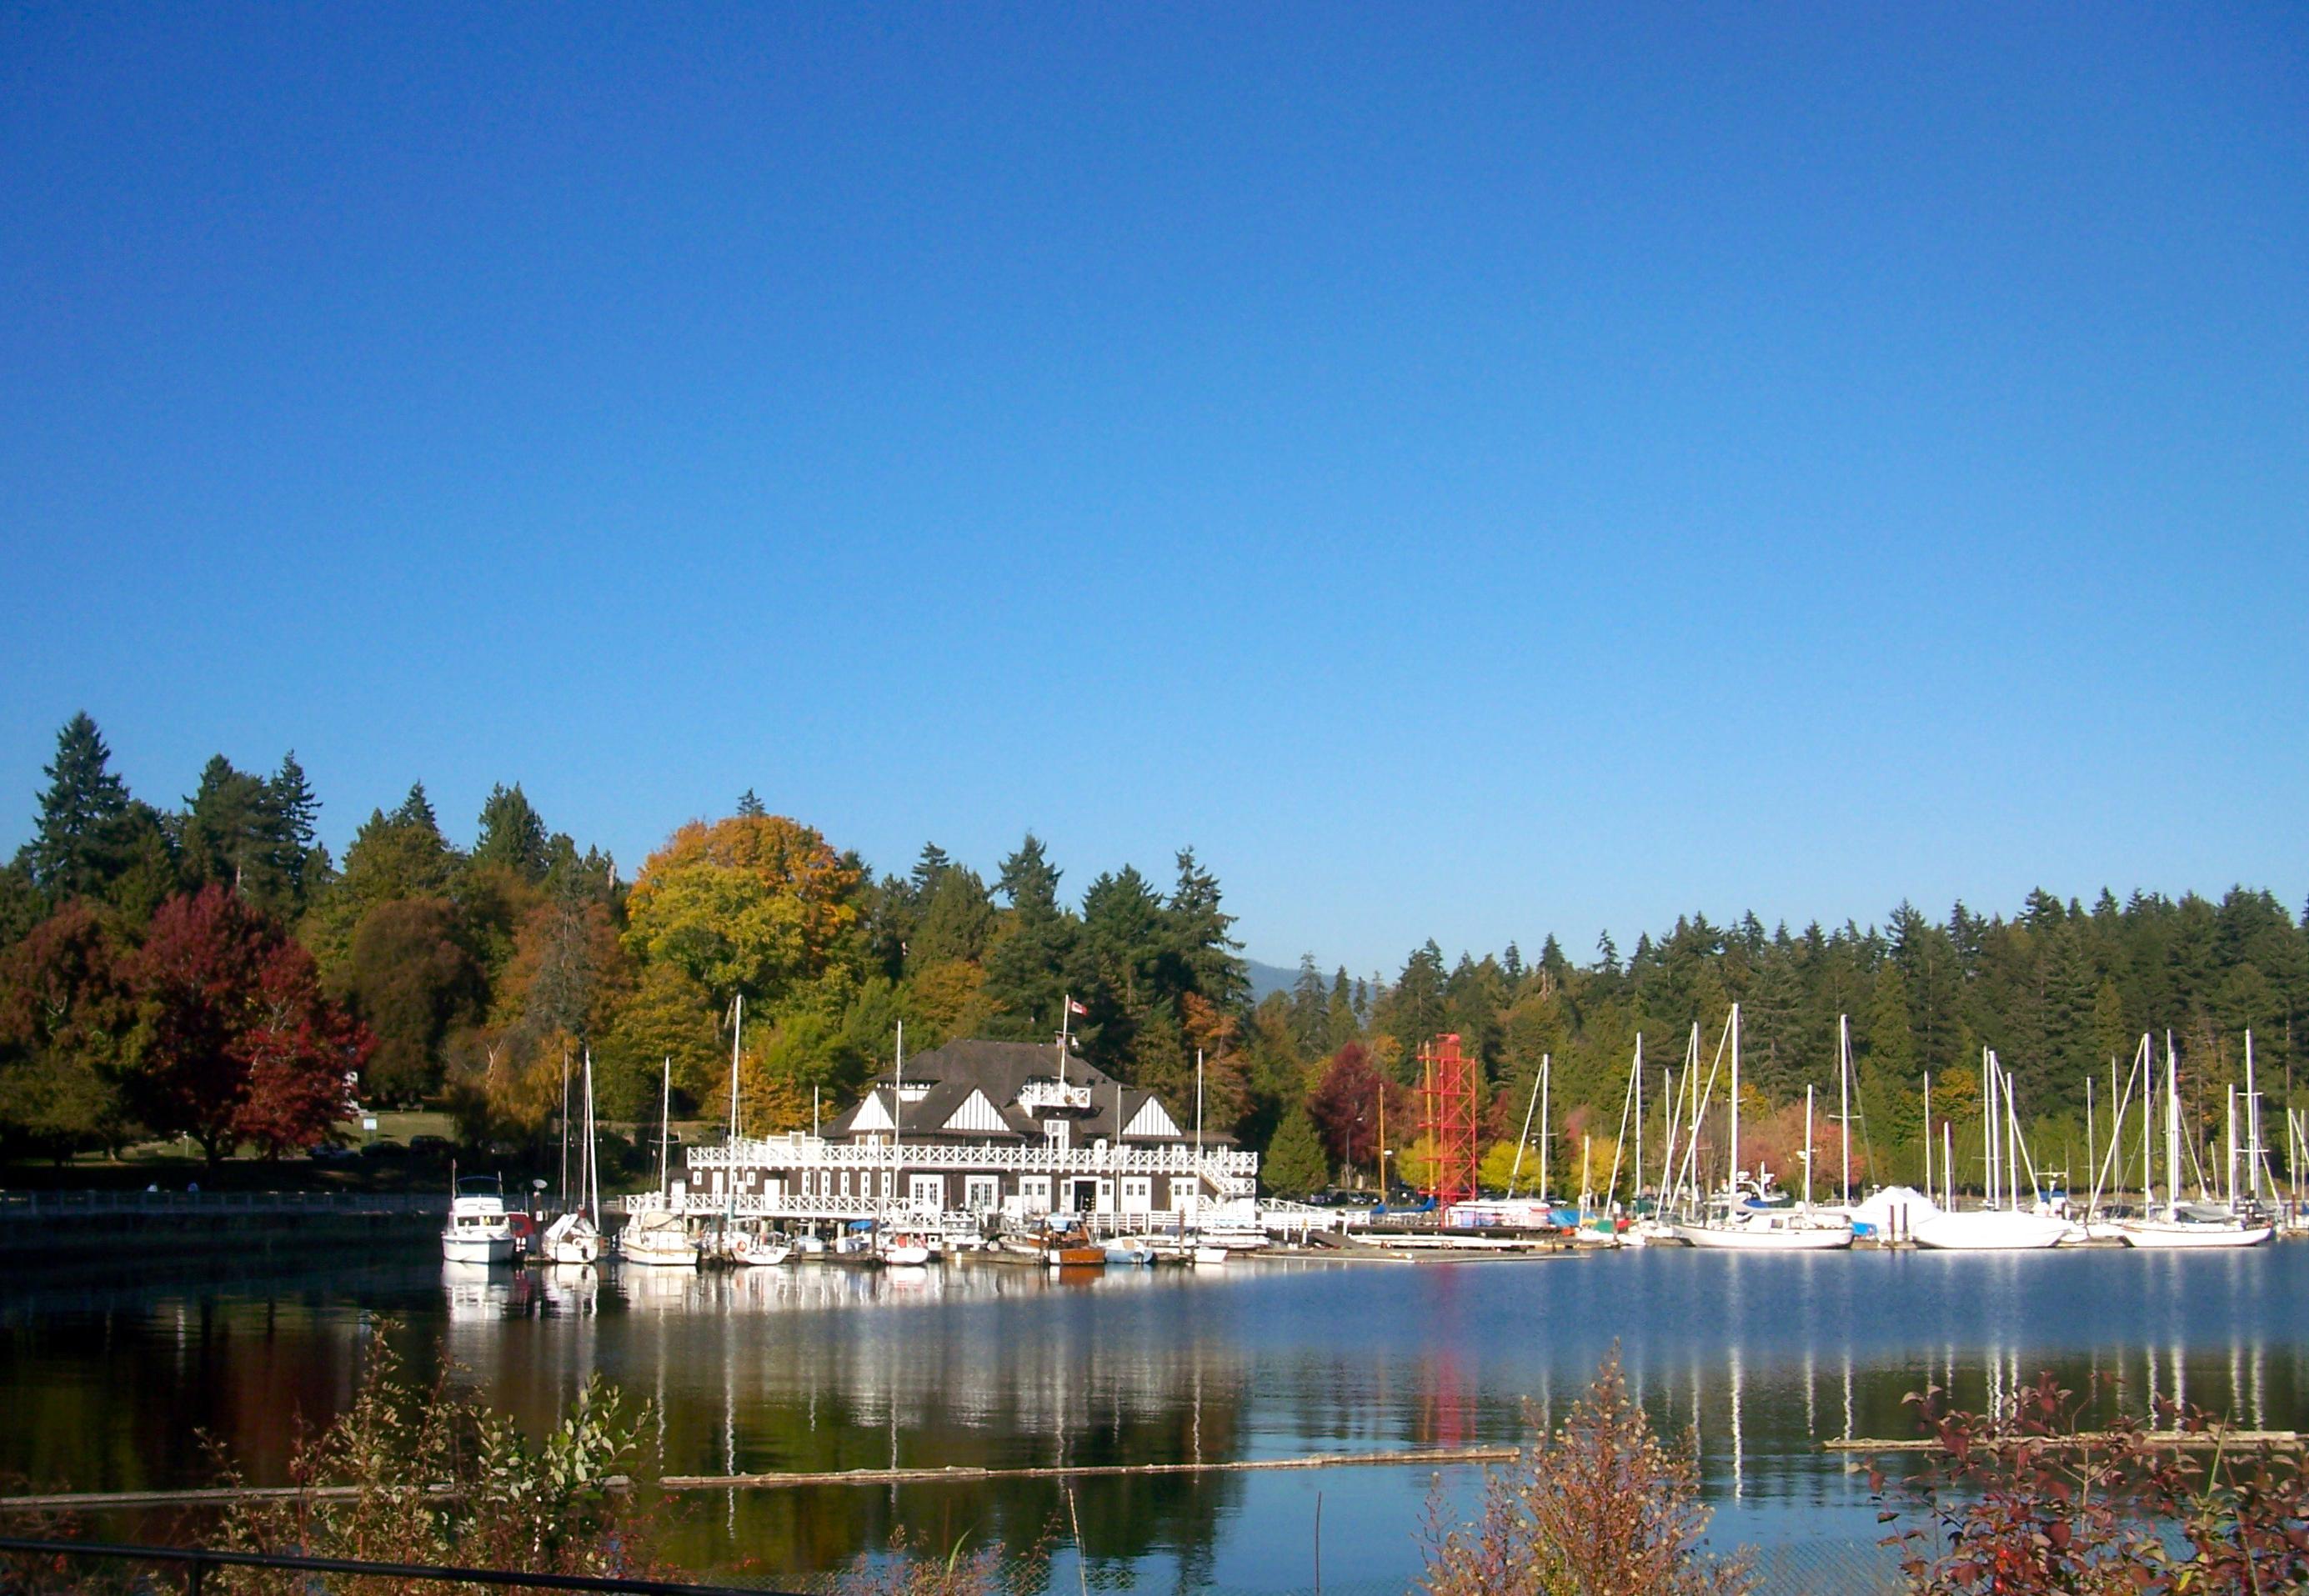 Vancouver Yacht Club , slimpaley.com